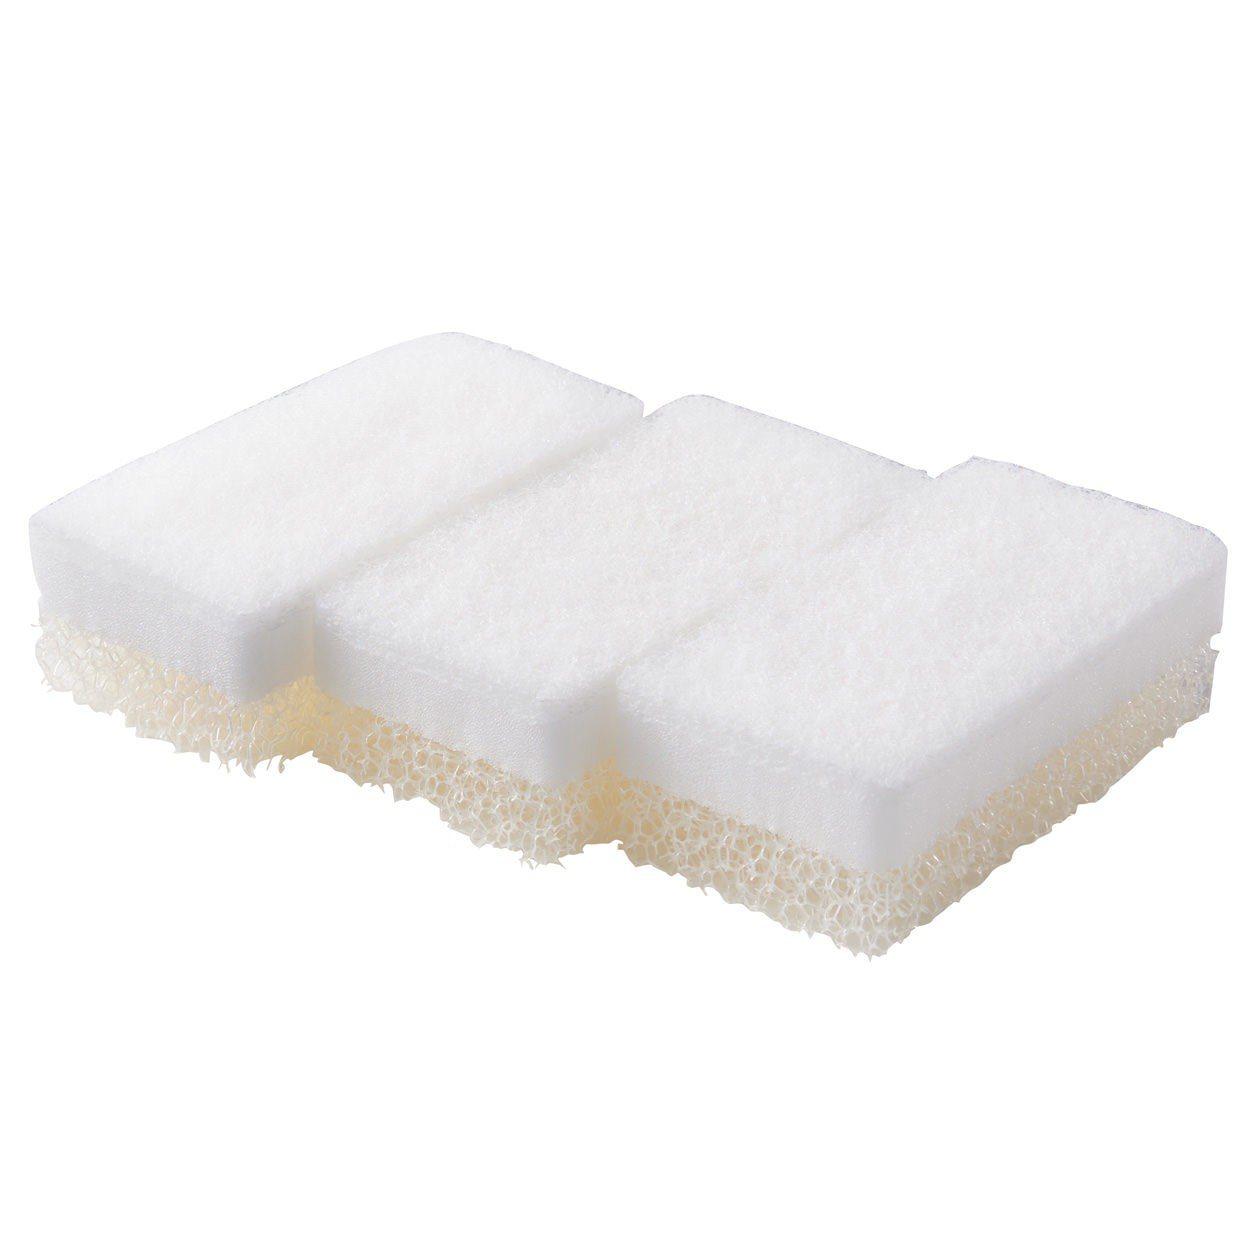 MUJI無印良品聚氨酯三層海綿3入,從原價160元調降為129元。圖/無印良品提...